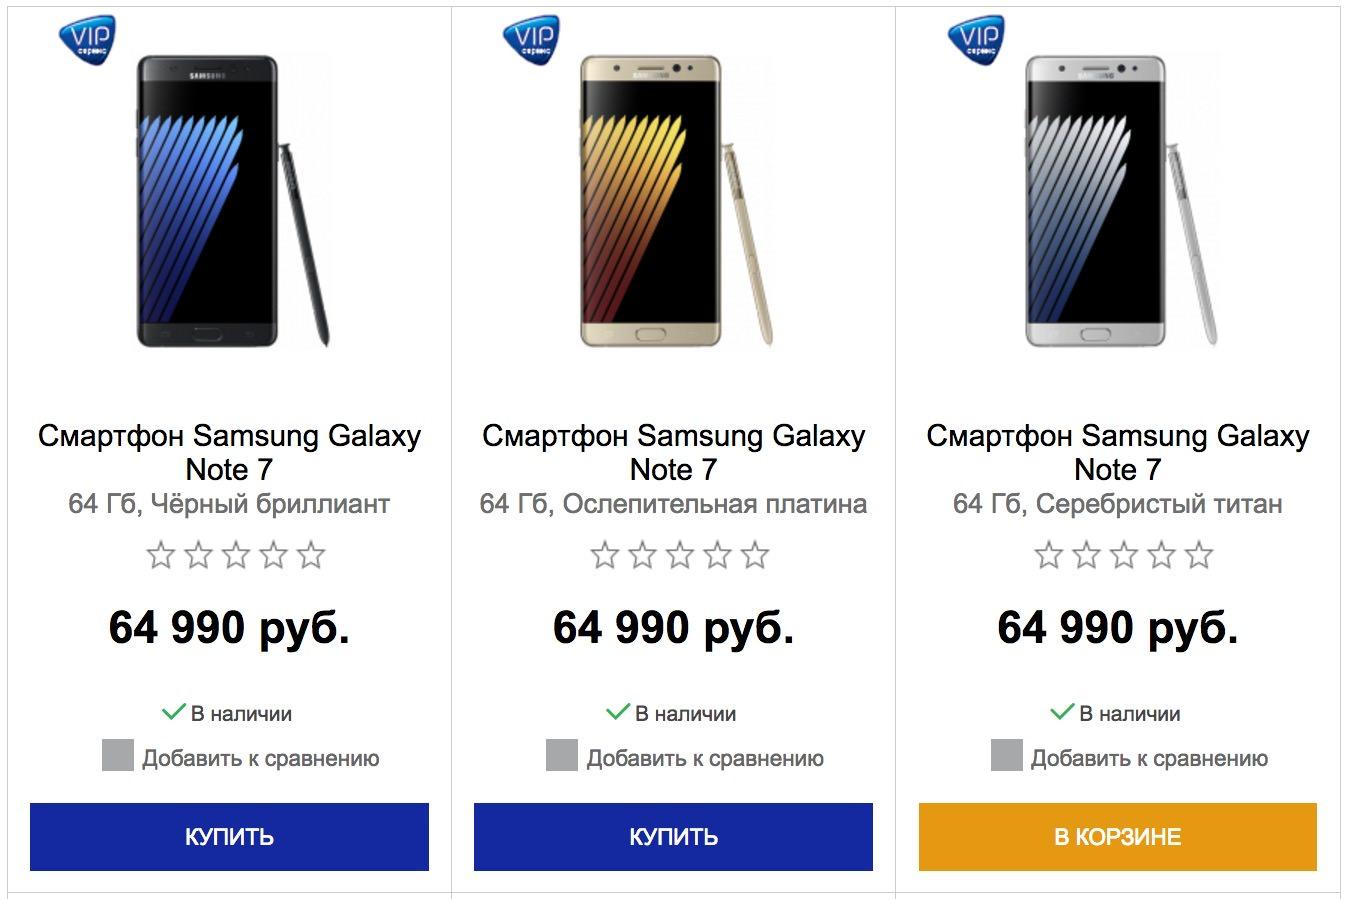 Samsung Galaxy Note 7 Russia Buy 2